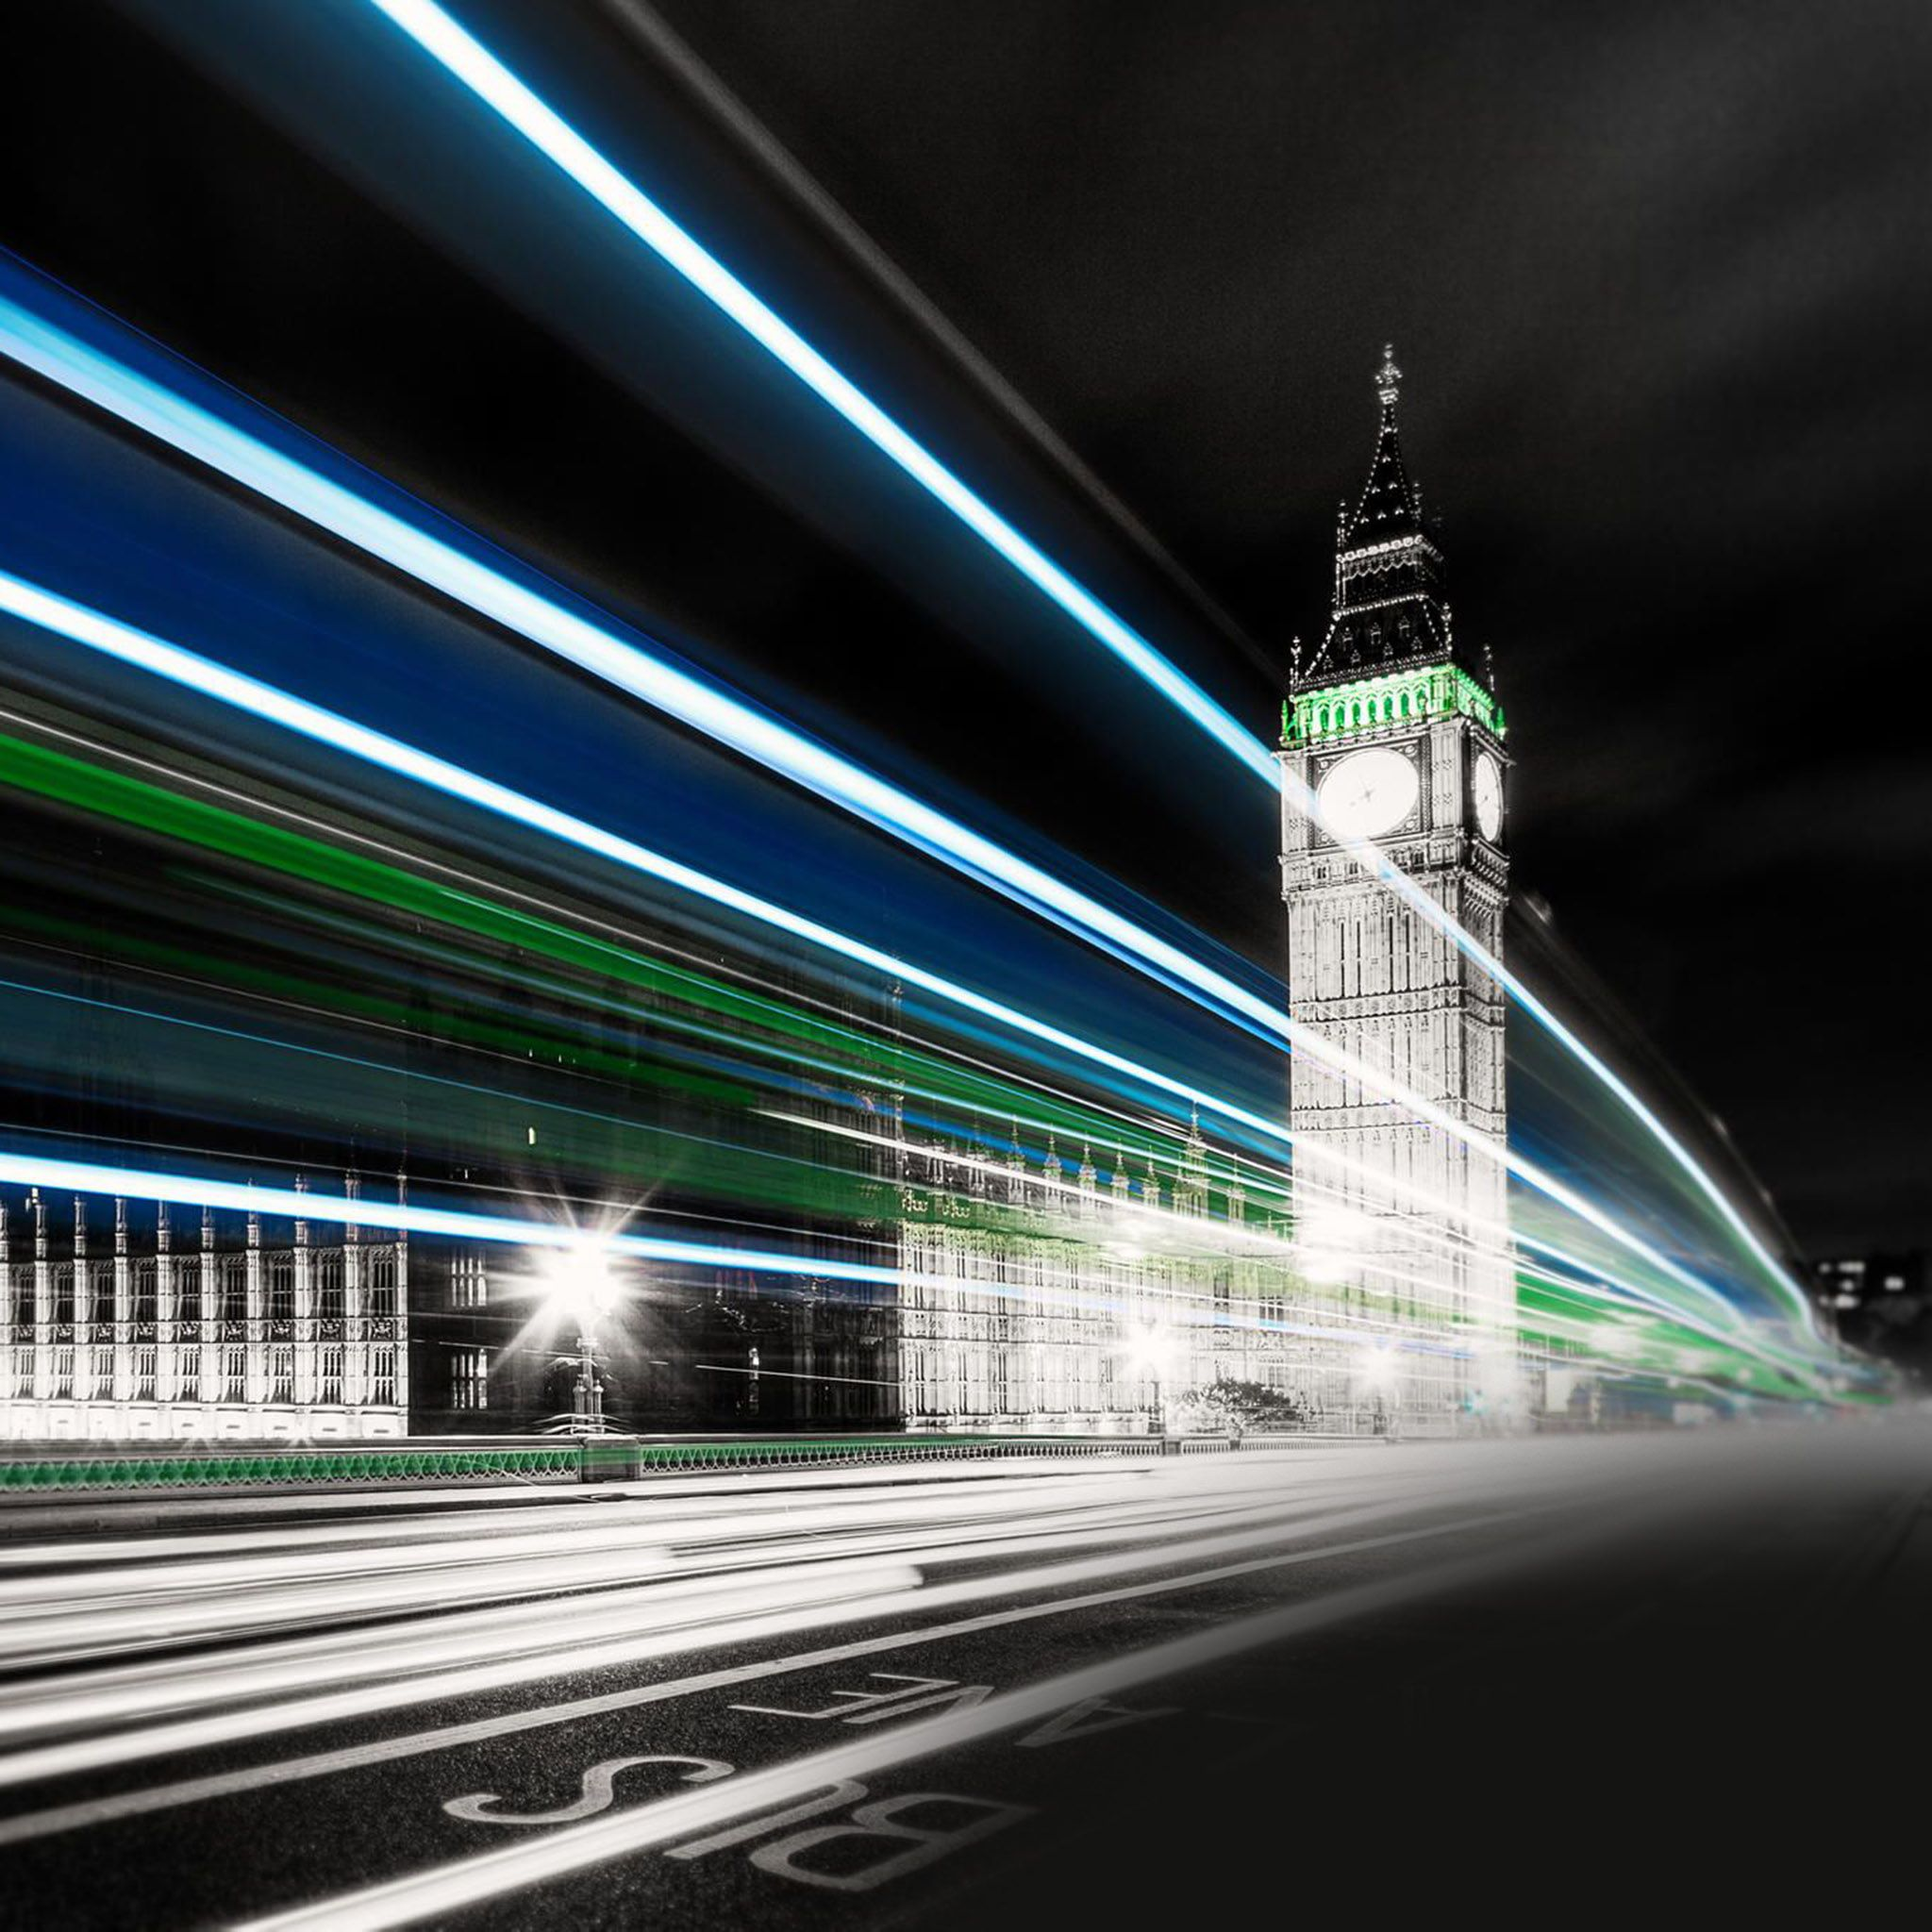 Big Ben Night Lights iPad Wallpaper HD Ipad air